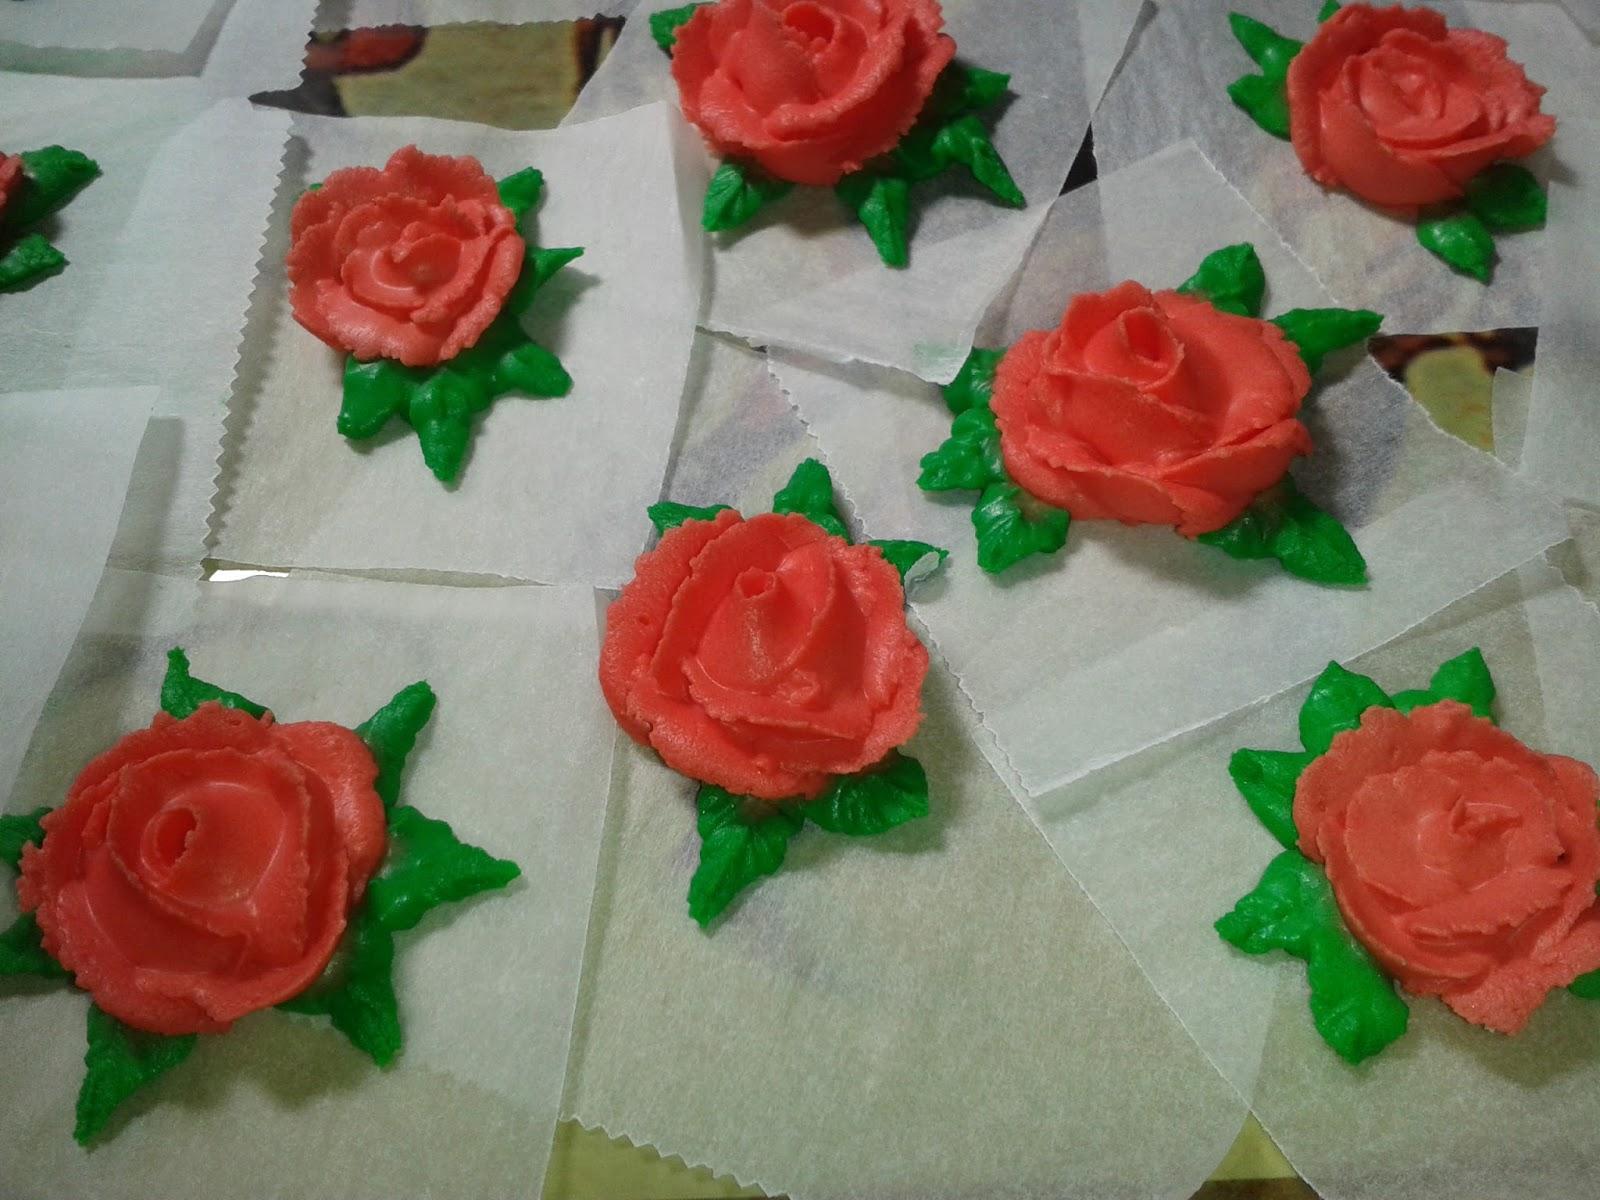 Agarimos | Cakes and Cookies: FIGURITAS DE GLASA REAL ( II ): ROSAS 3D